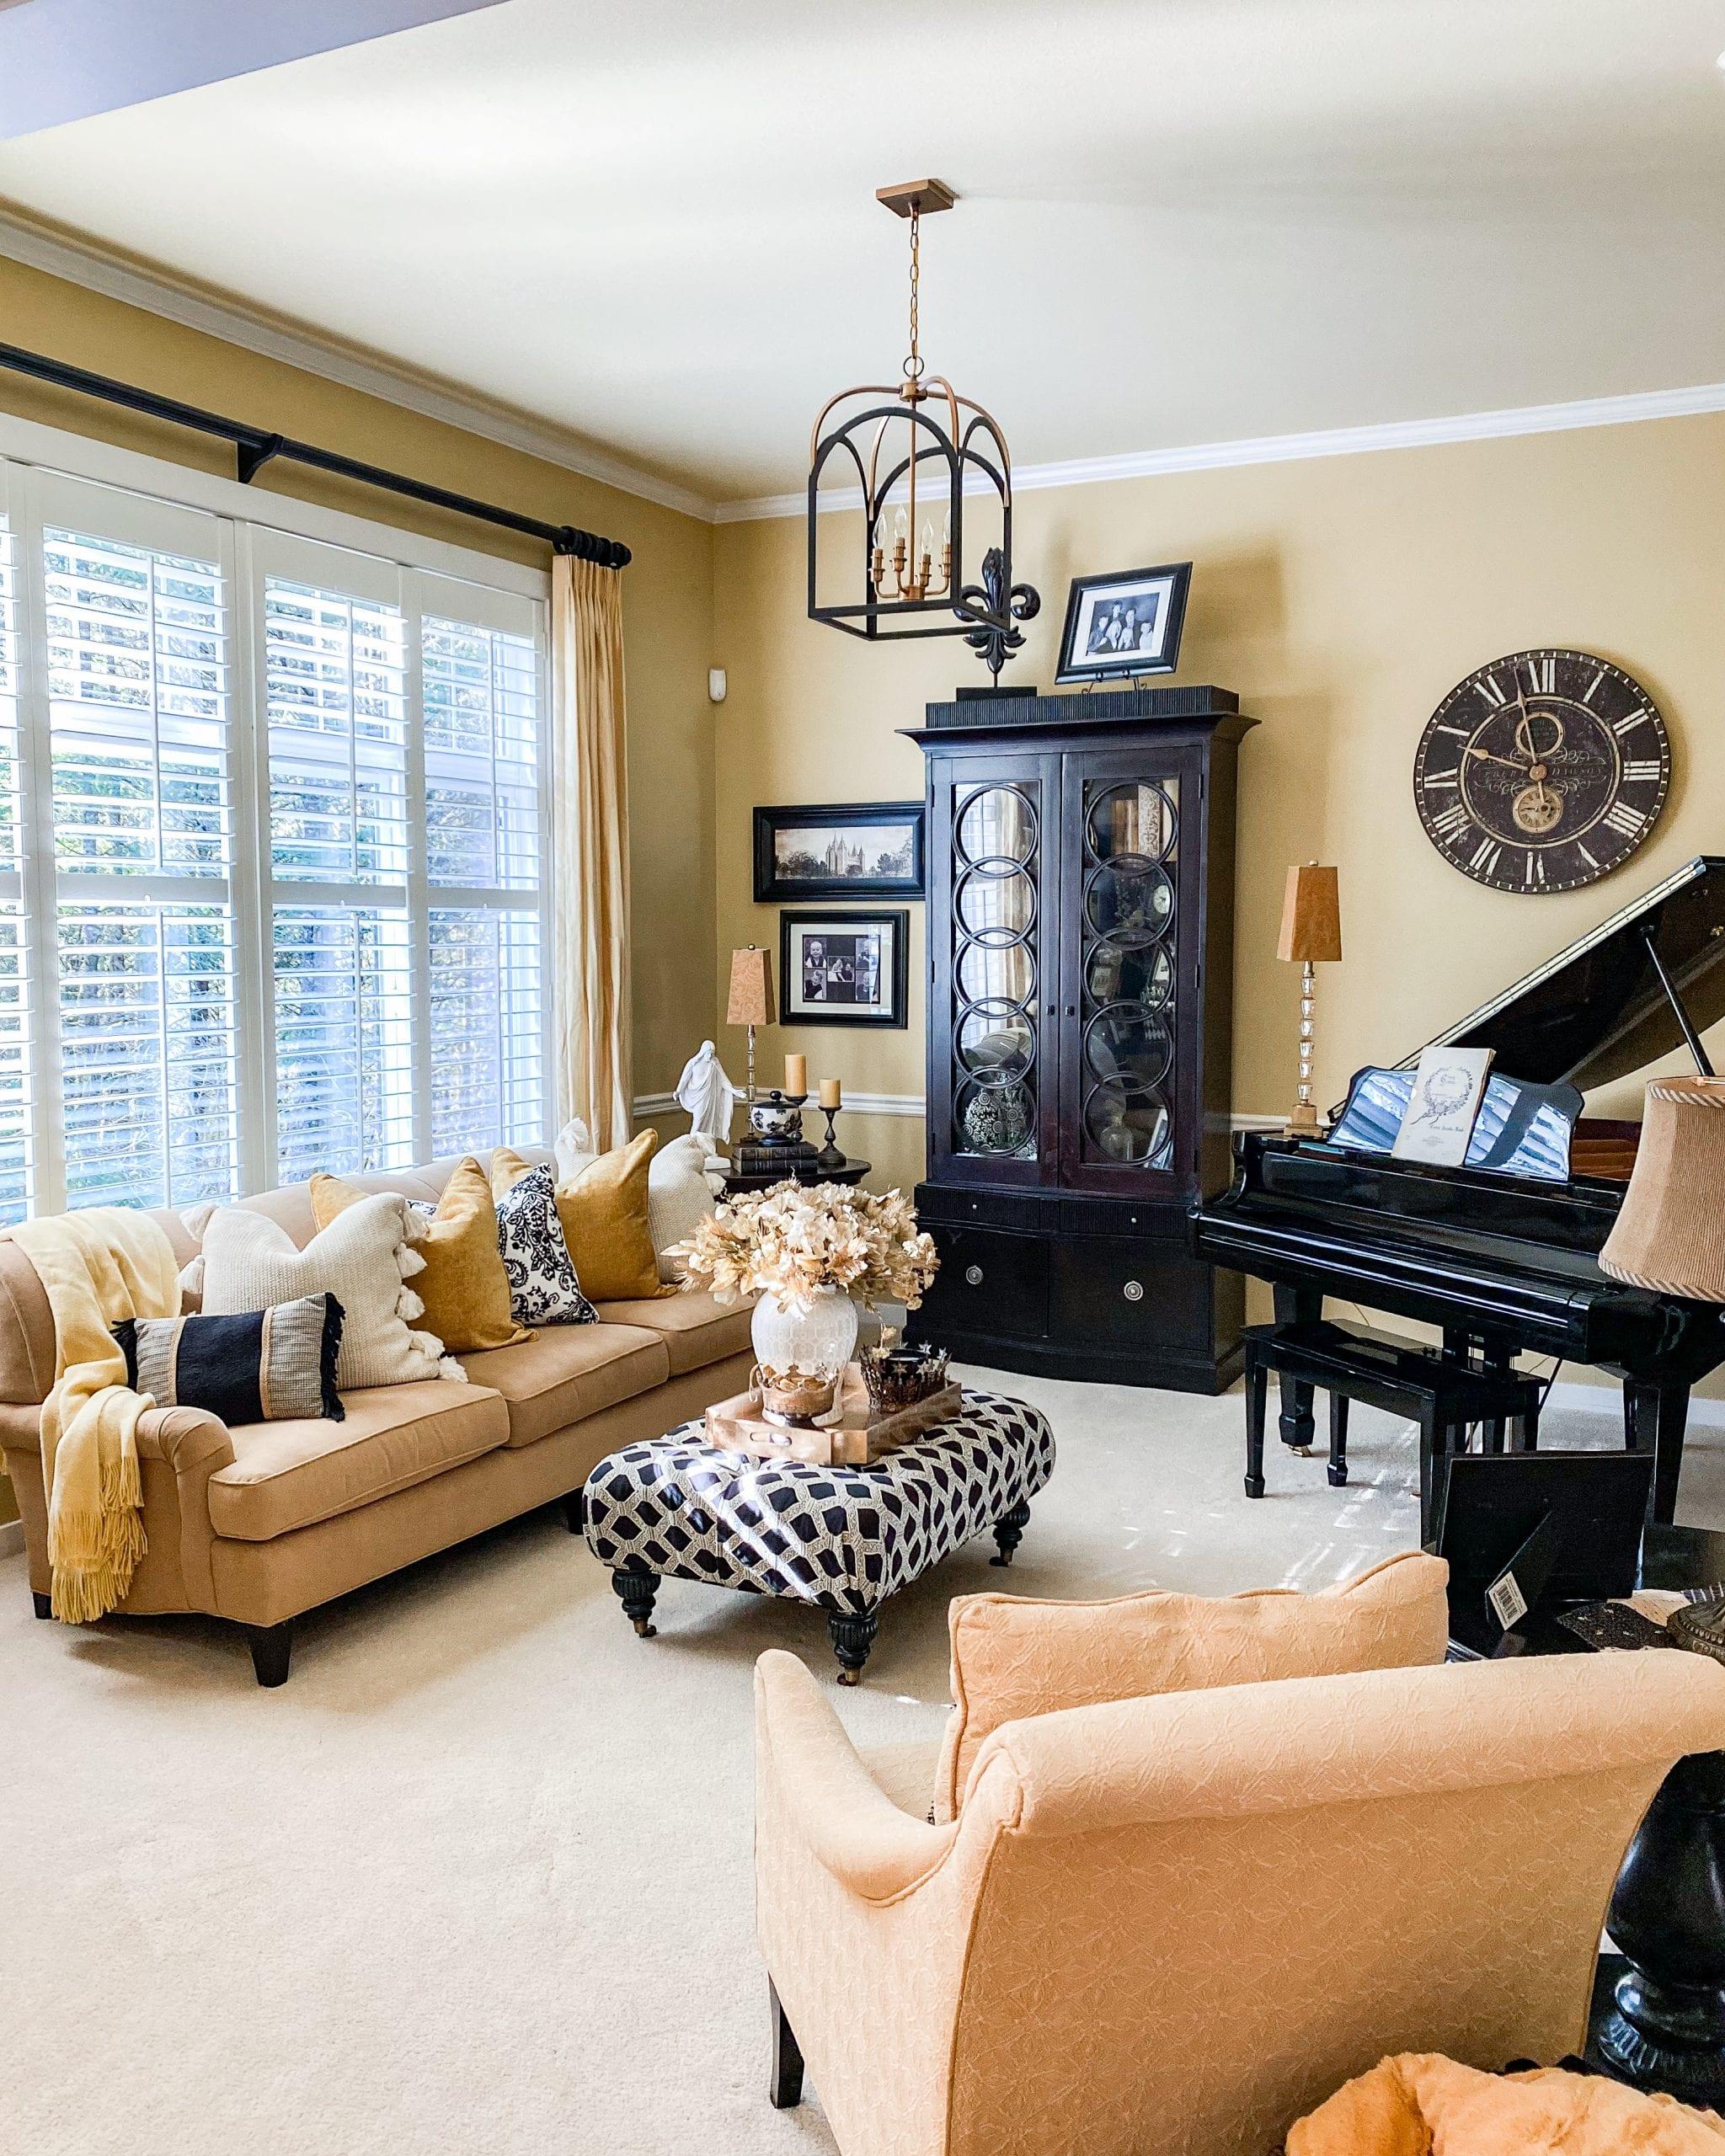 living room pendant lighting, Updating Lights In Your Home